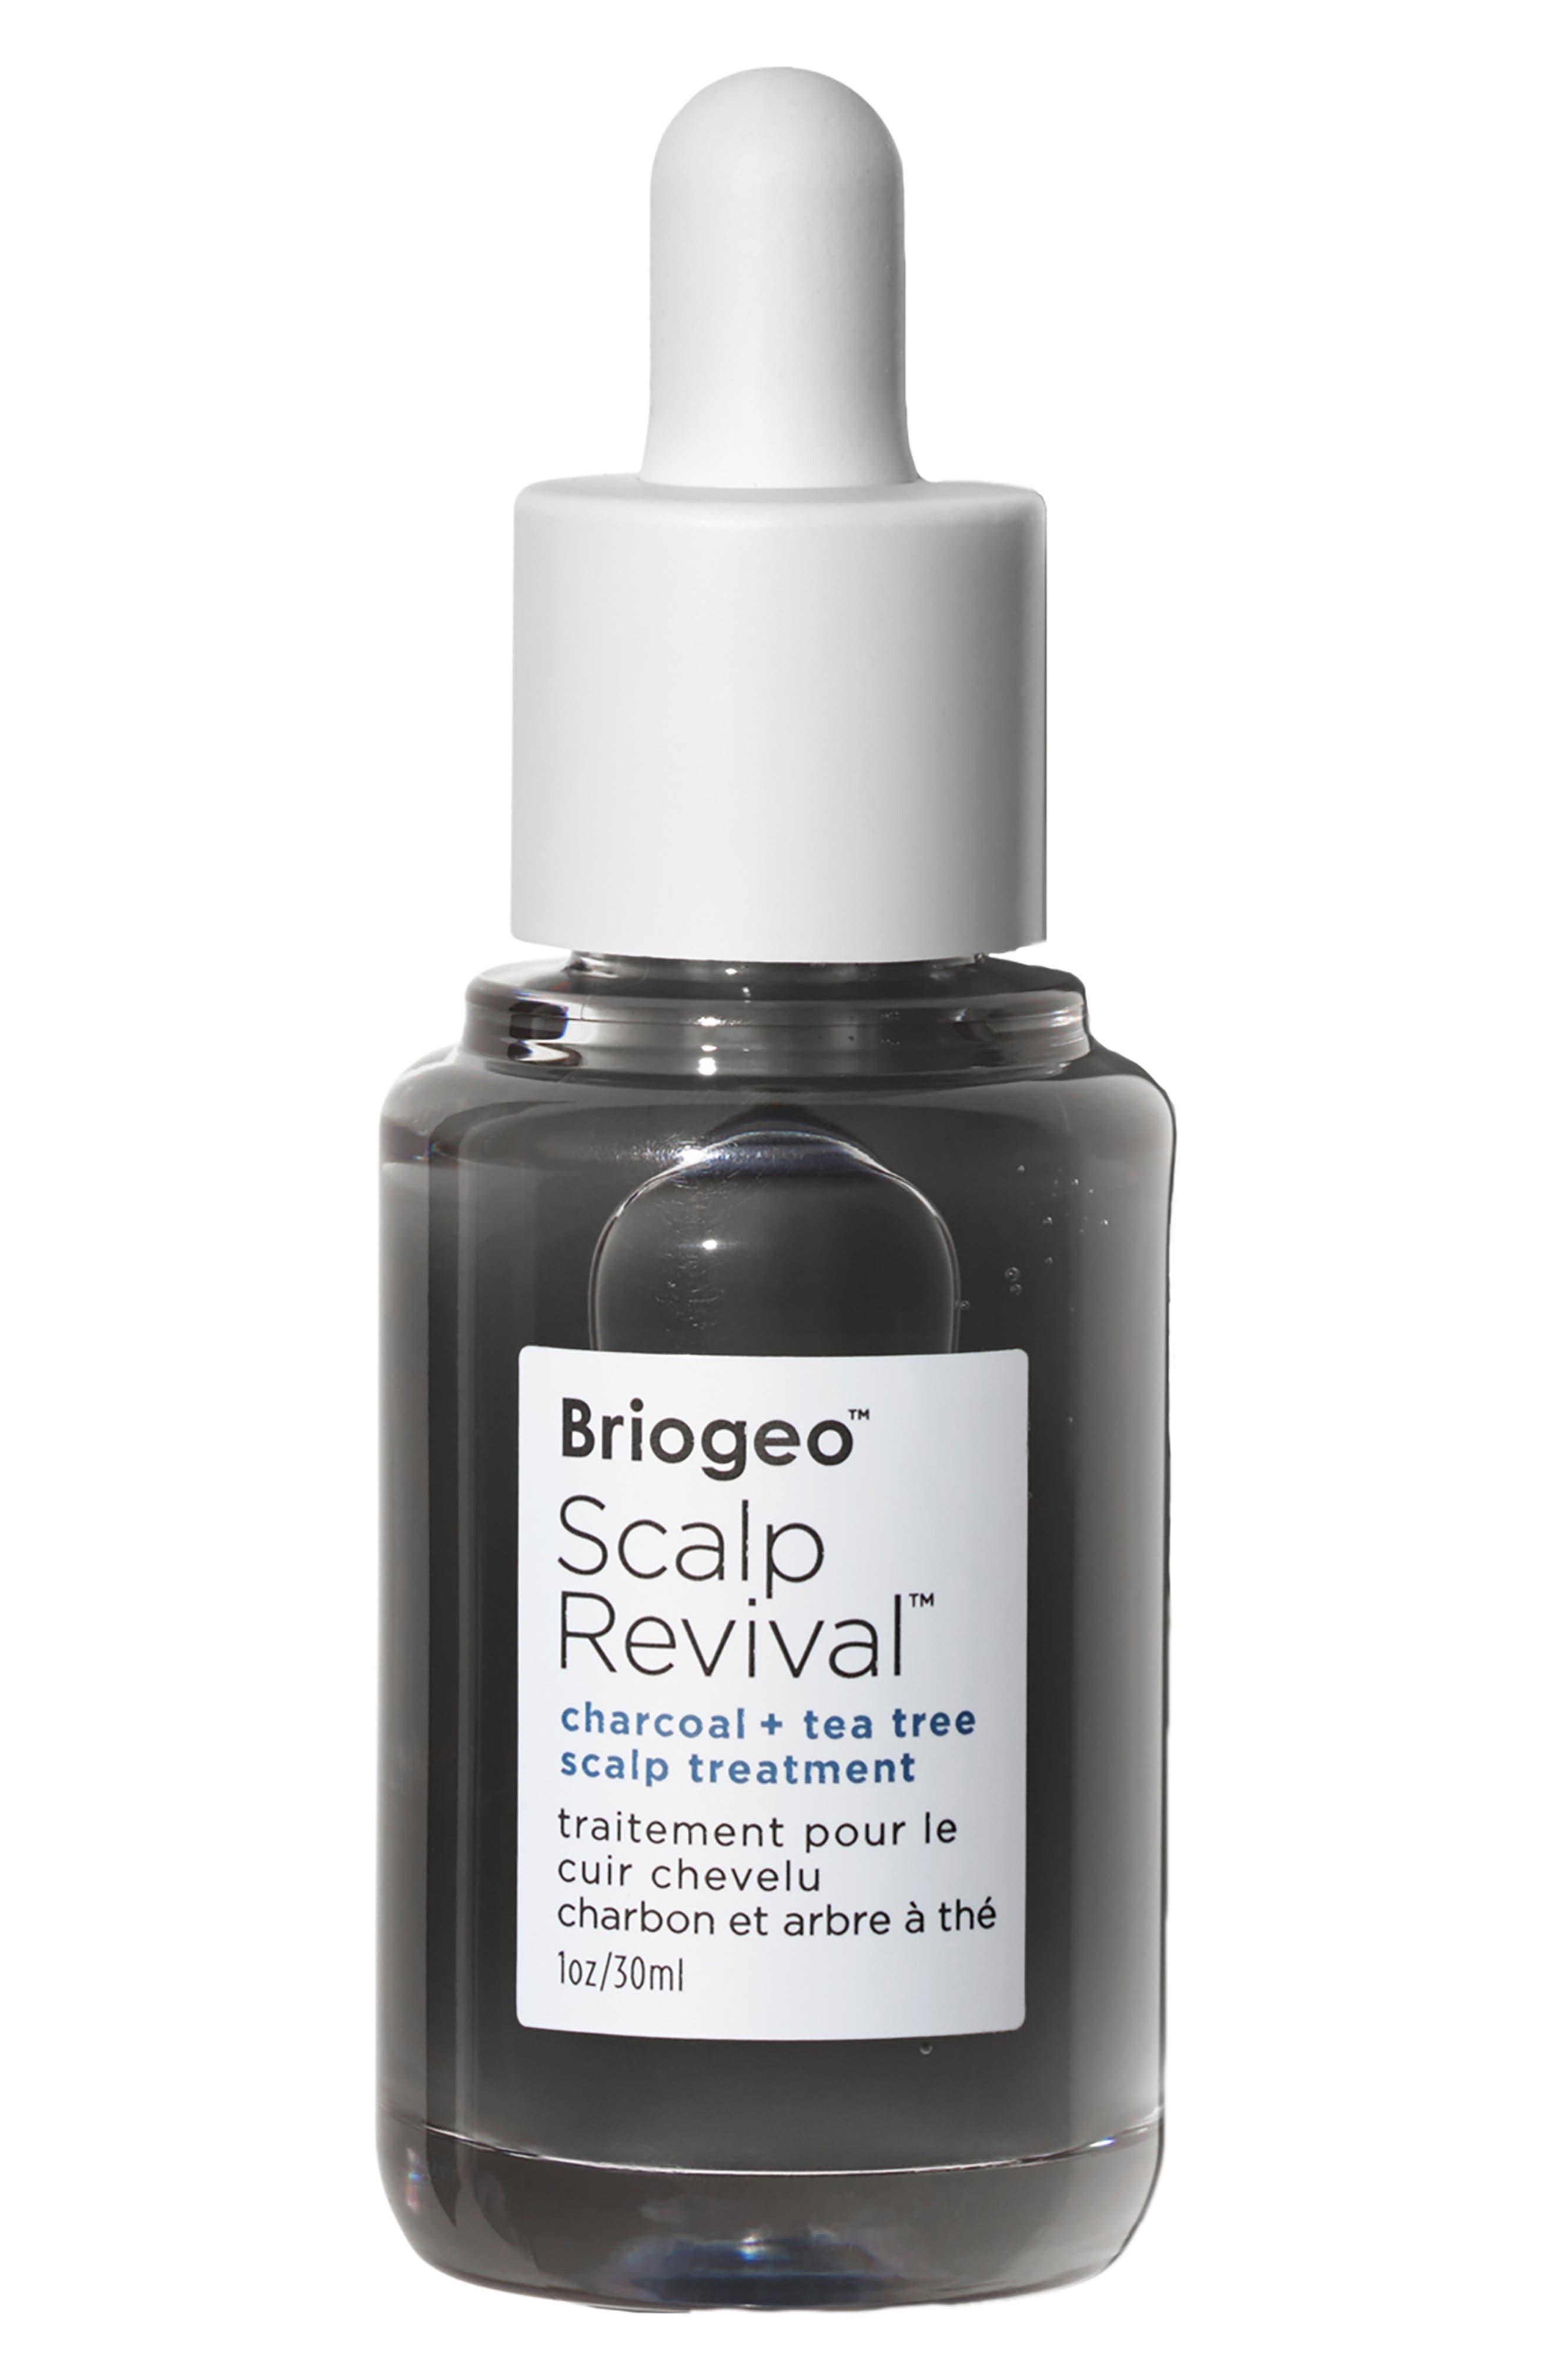 Scalp Revival Charcoal + Tea Tree Scalp Treatment